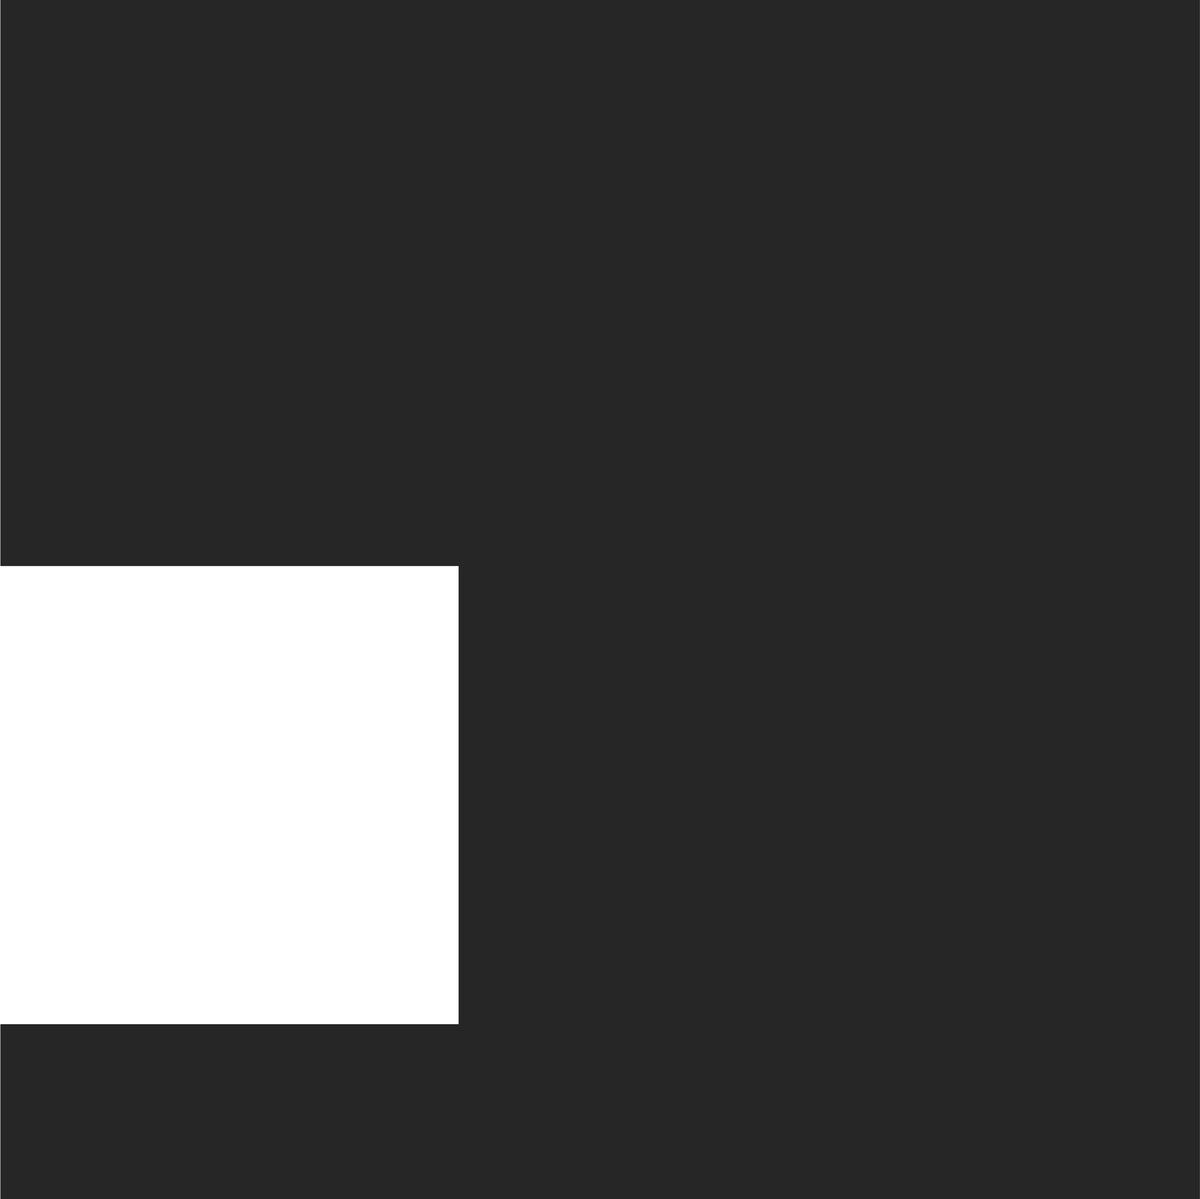 f:id:tomtom_com:20191223152203j:plain